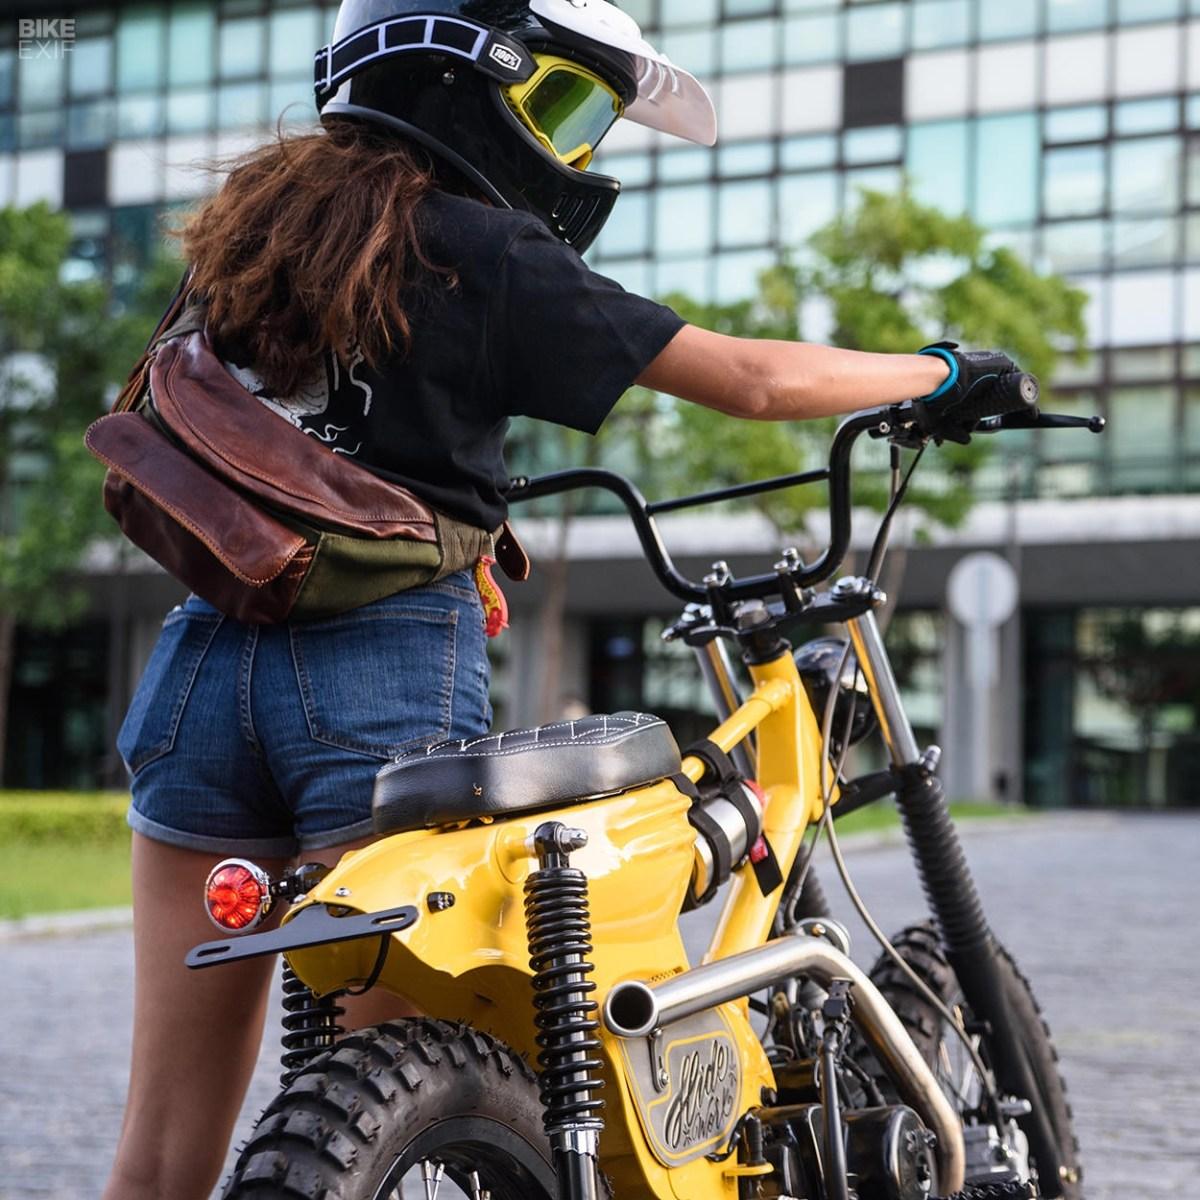 trick a bmx style sym from hide work custom bike exif